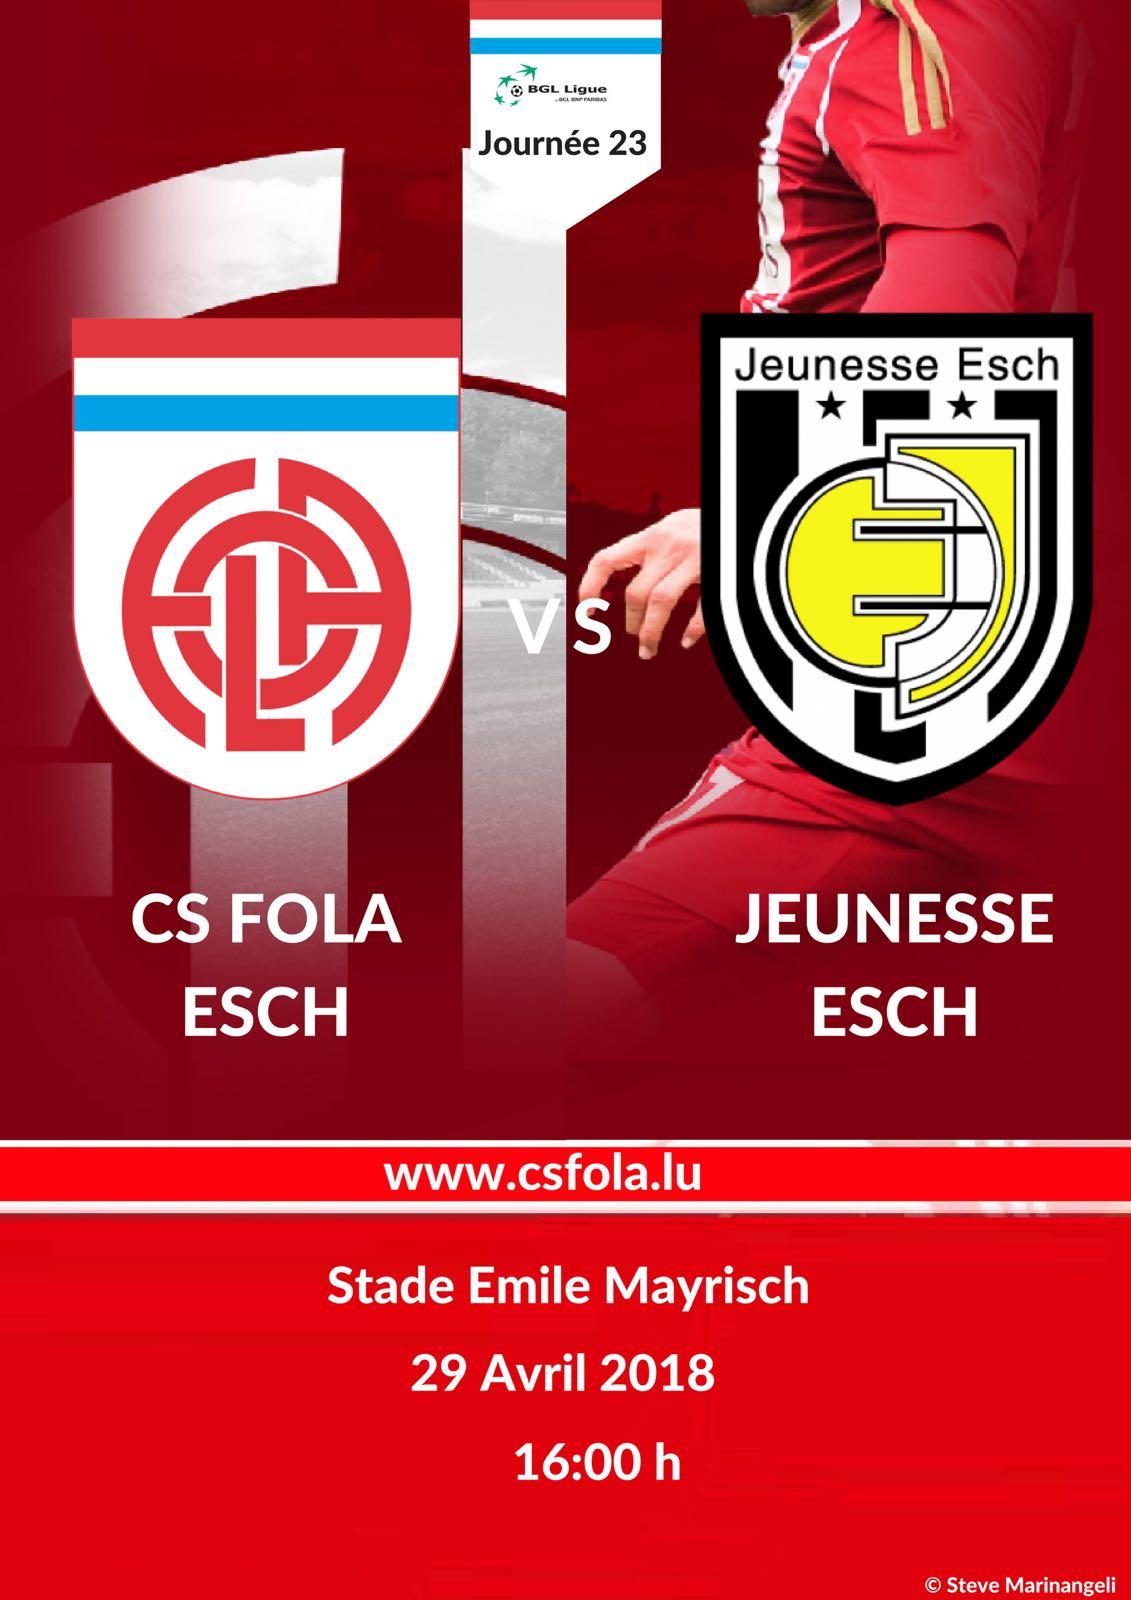 CS FOLA vs Jeunesse Esch